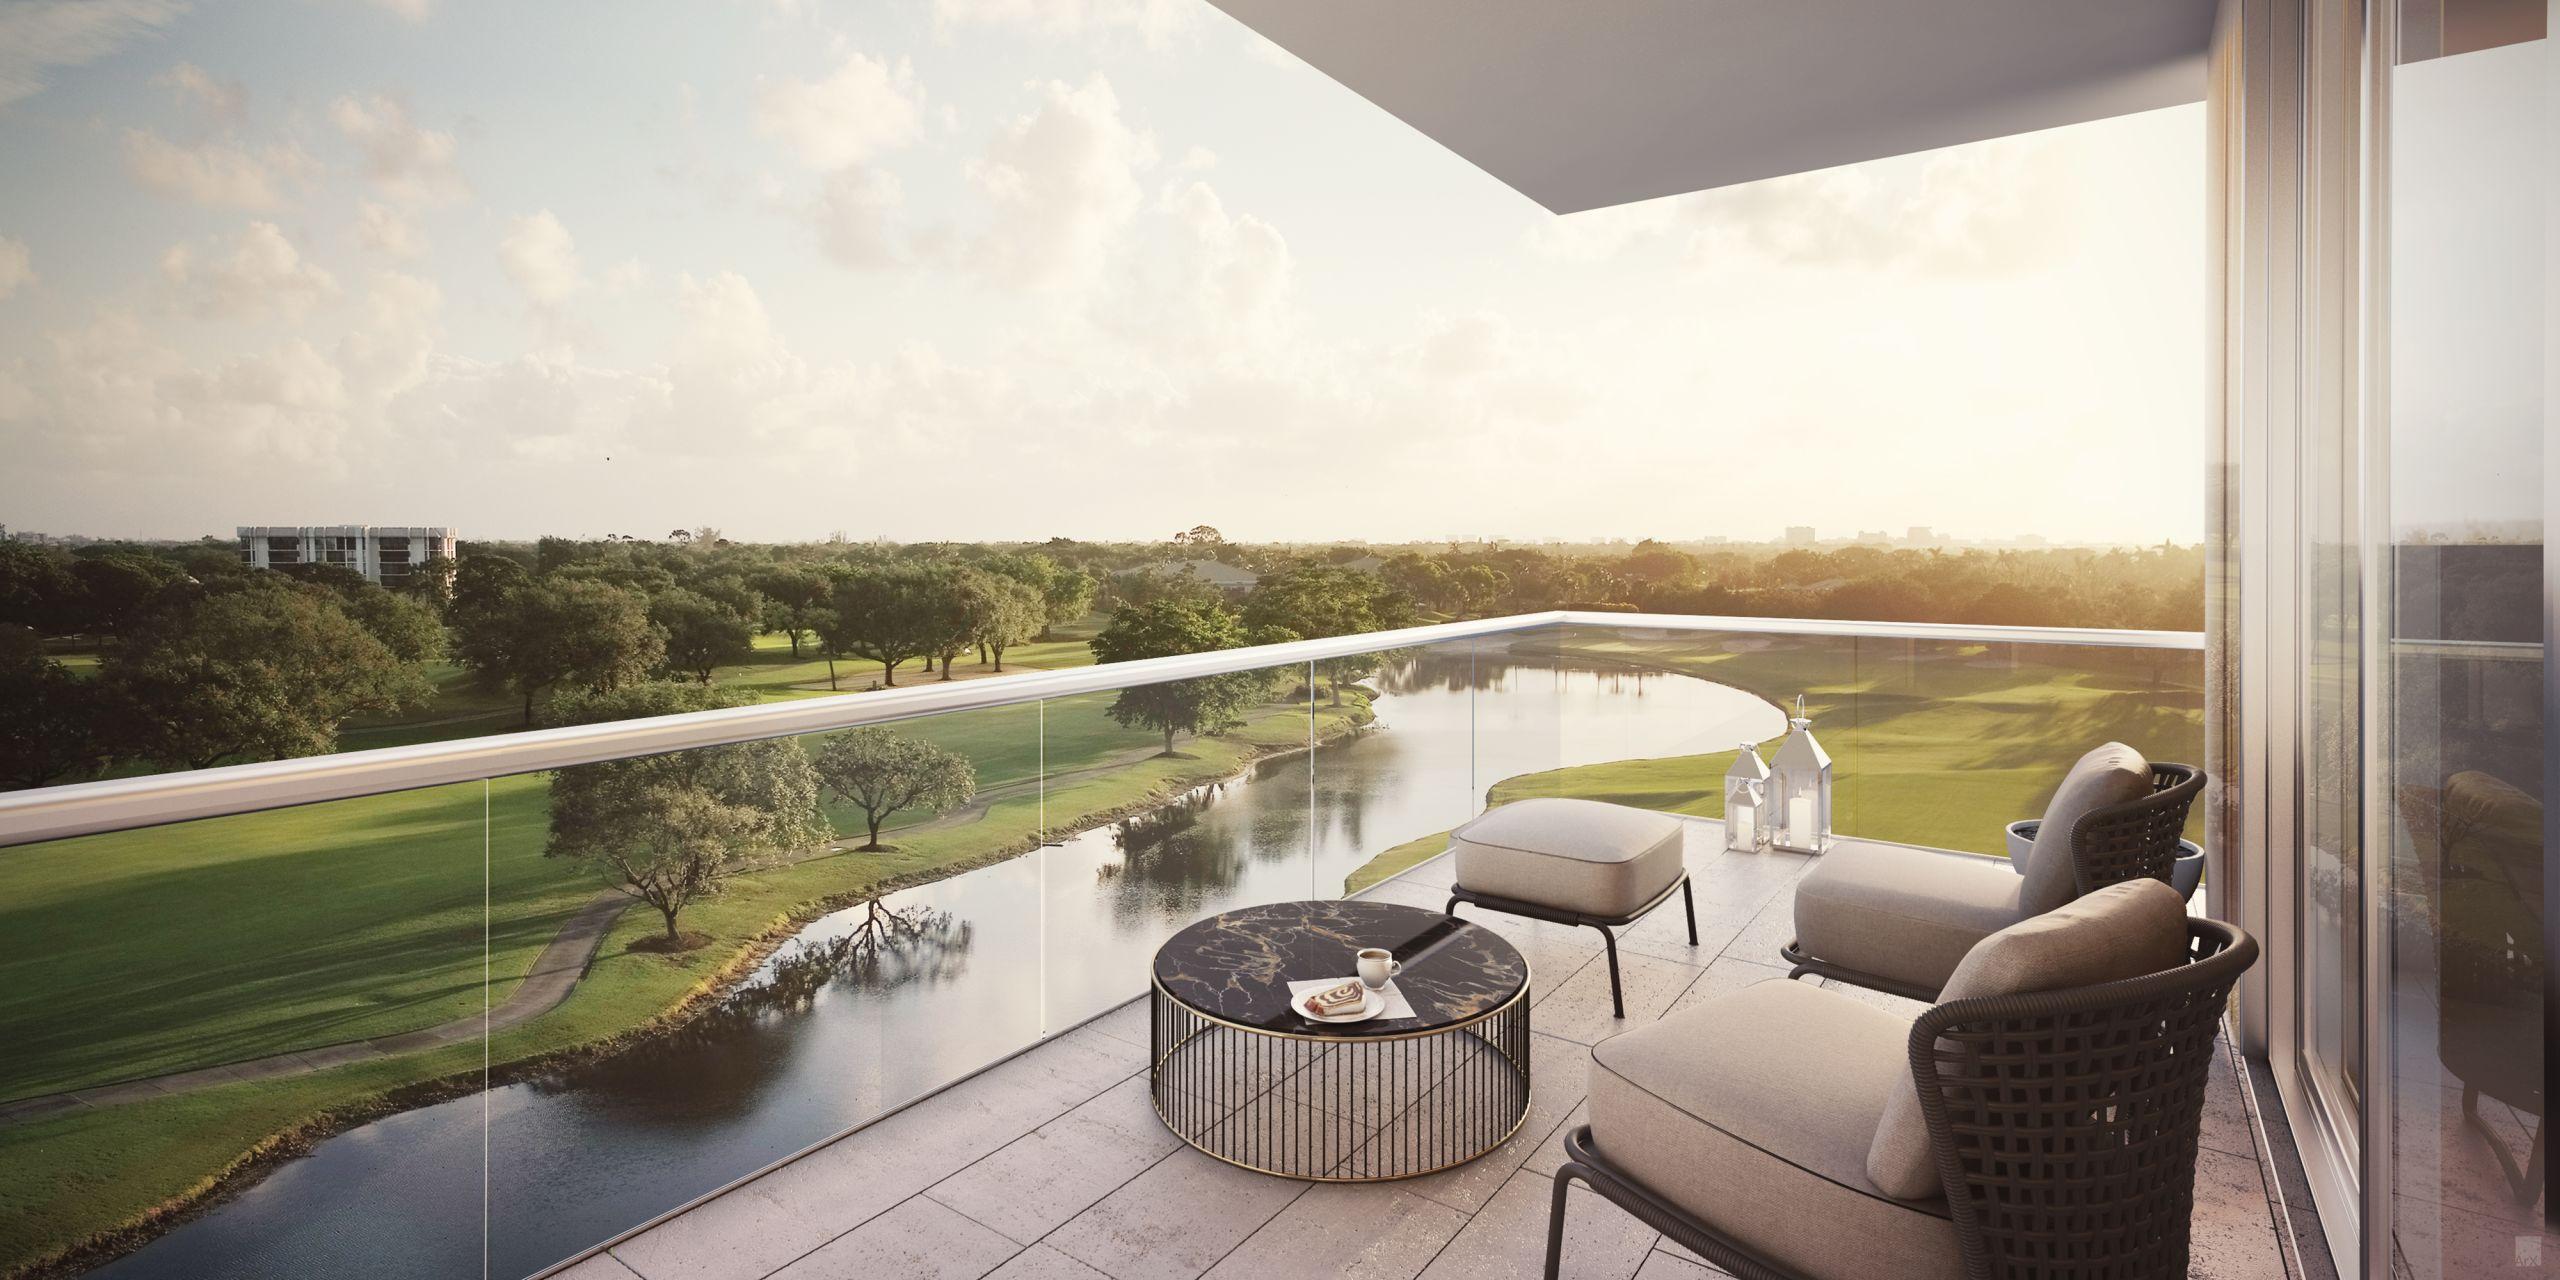 residence-balcony-views-2560x1280 Seeking the Ideal Home in New Luxury Developments